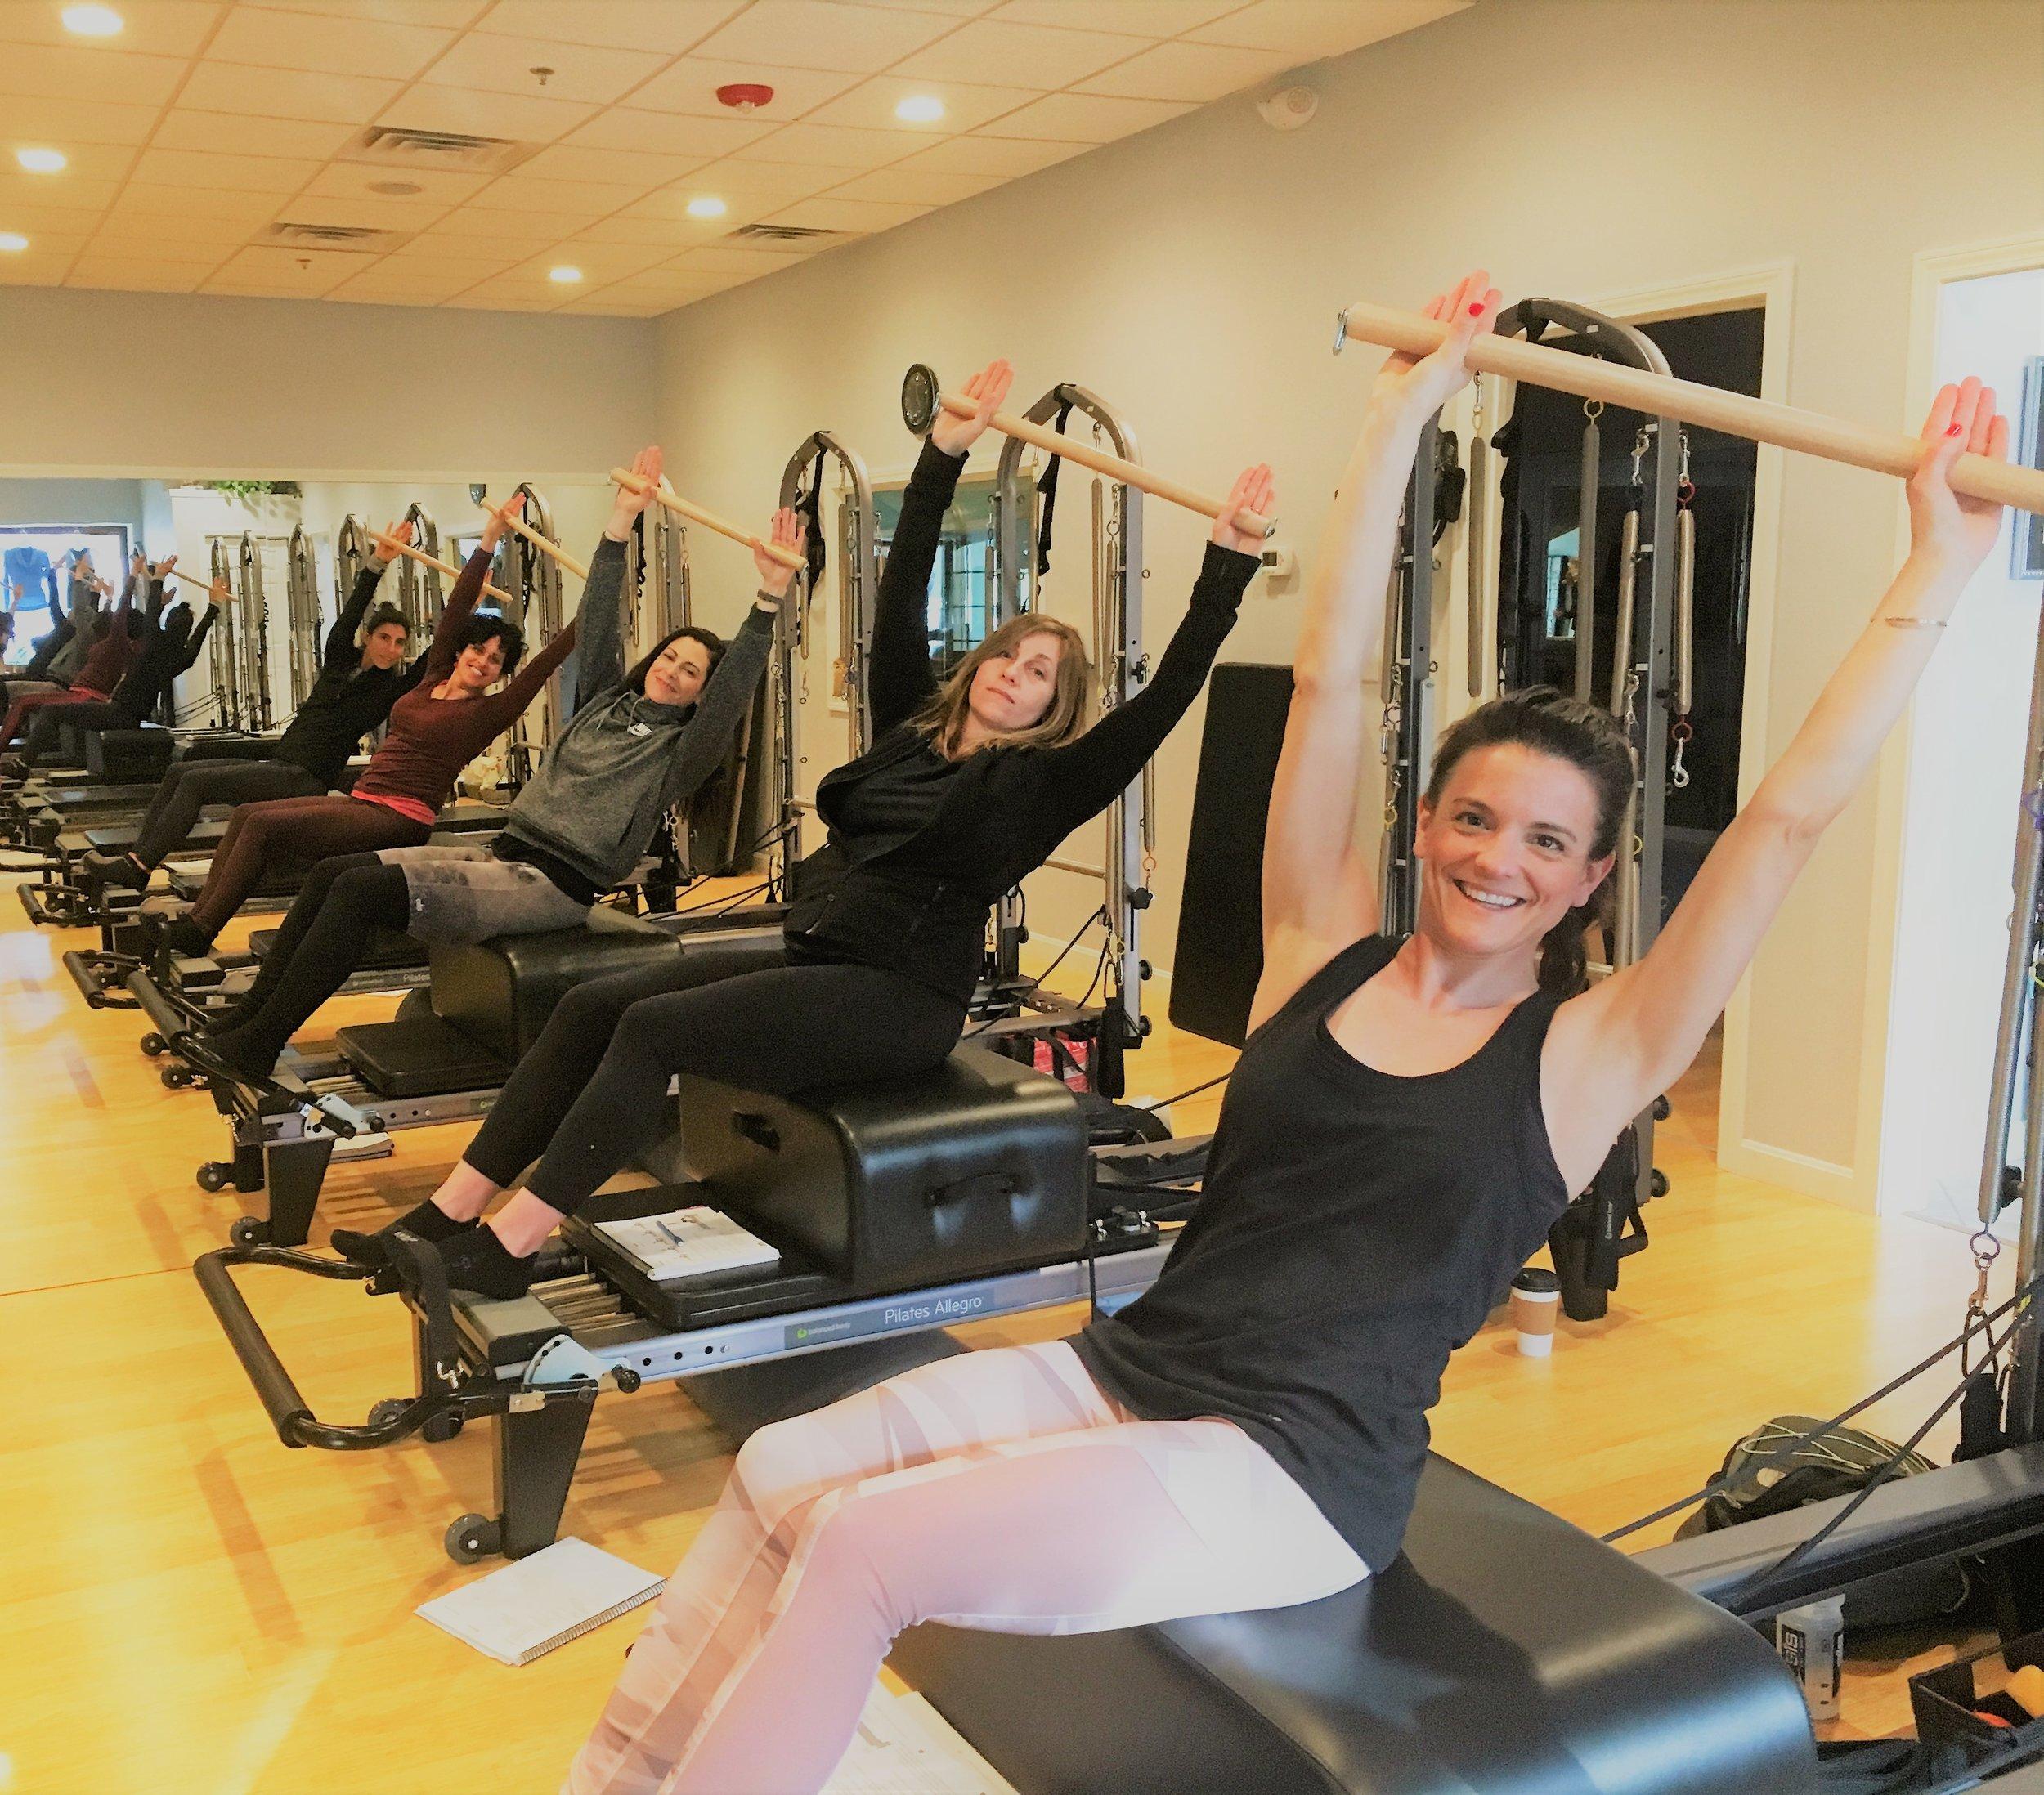 Healthy-Changes-Pilates-twist.jpg